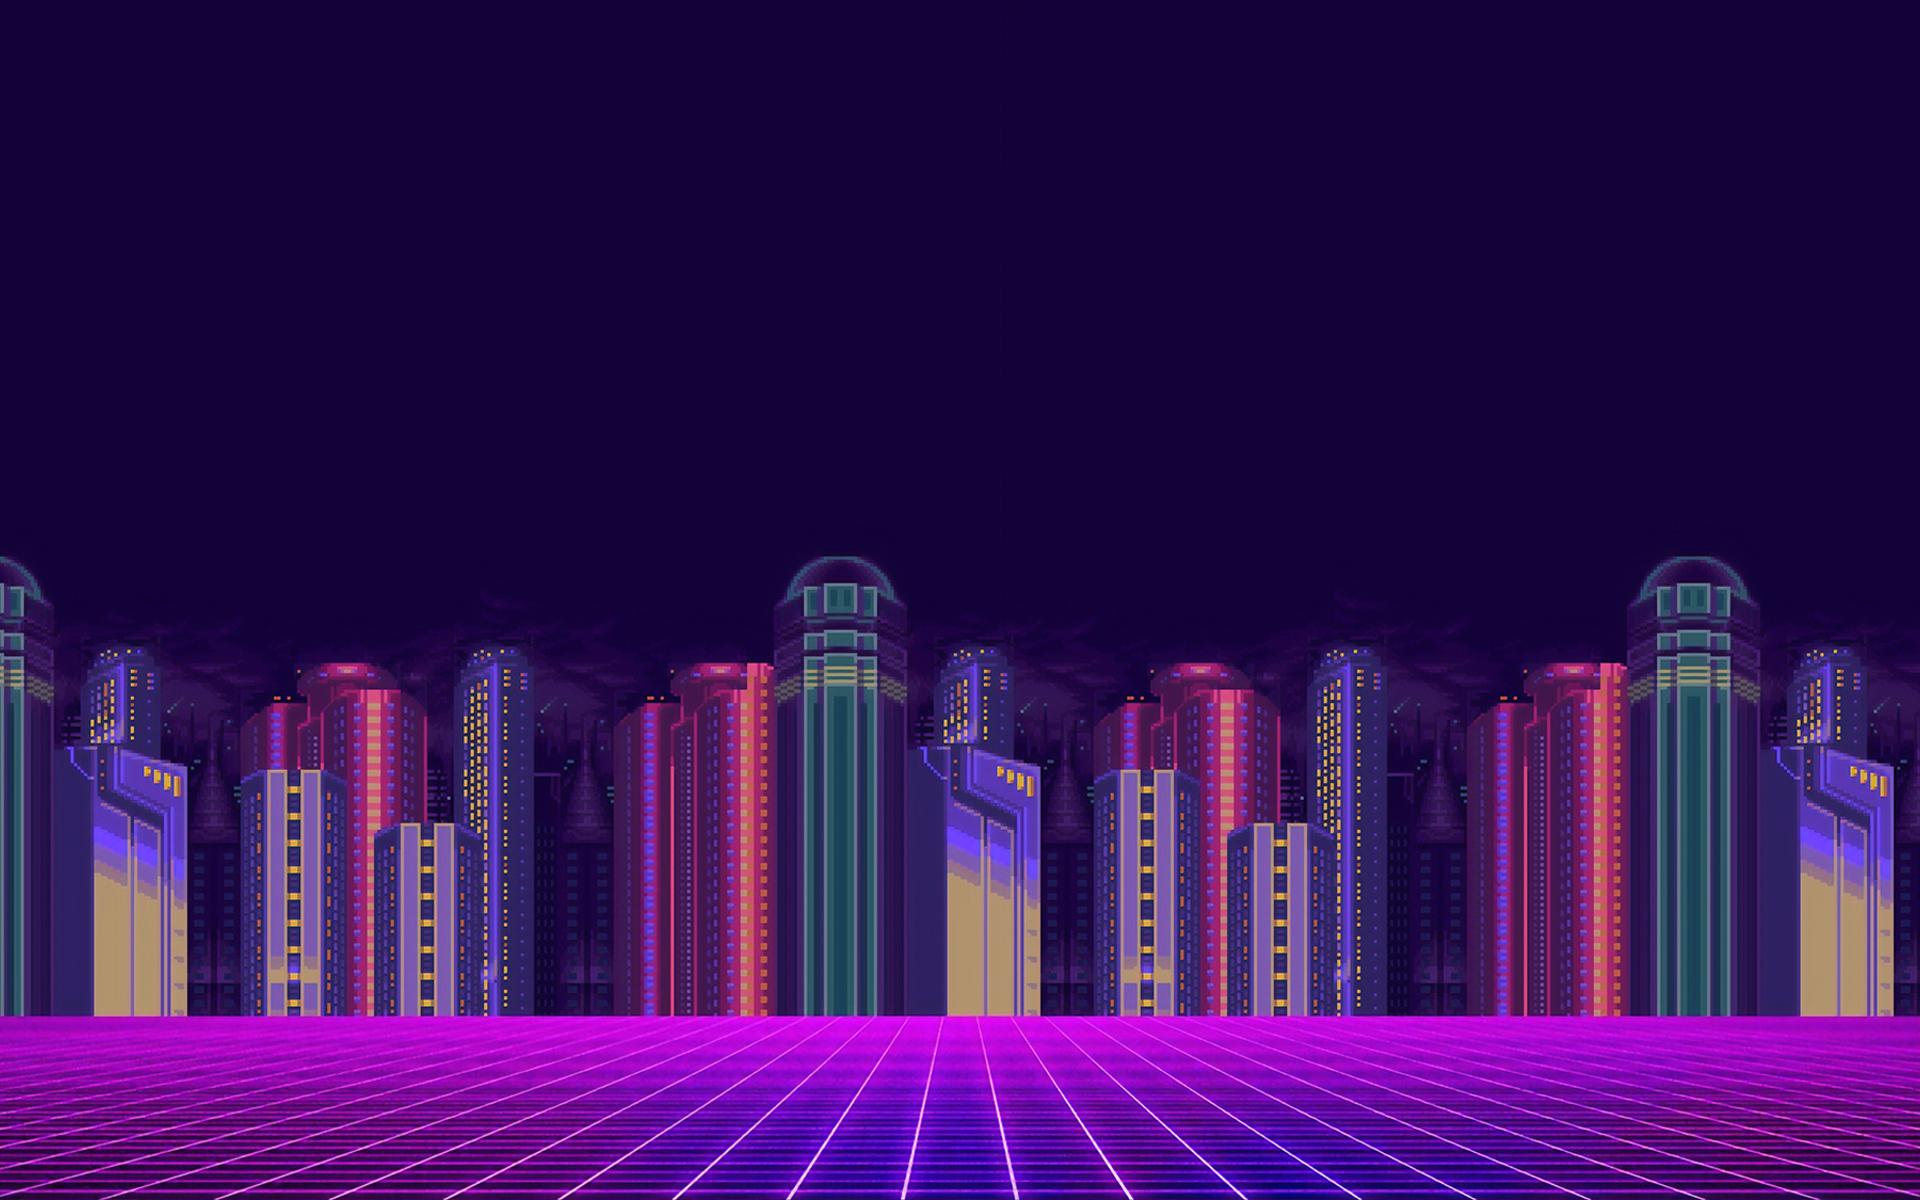 synthwave-buildings-8-bit-tt.jpg